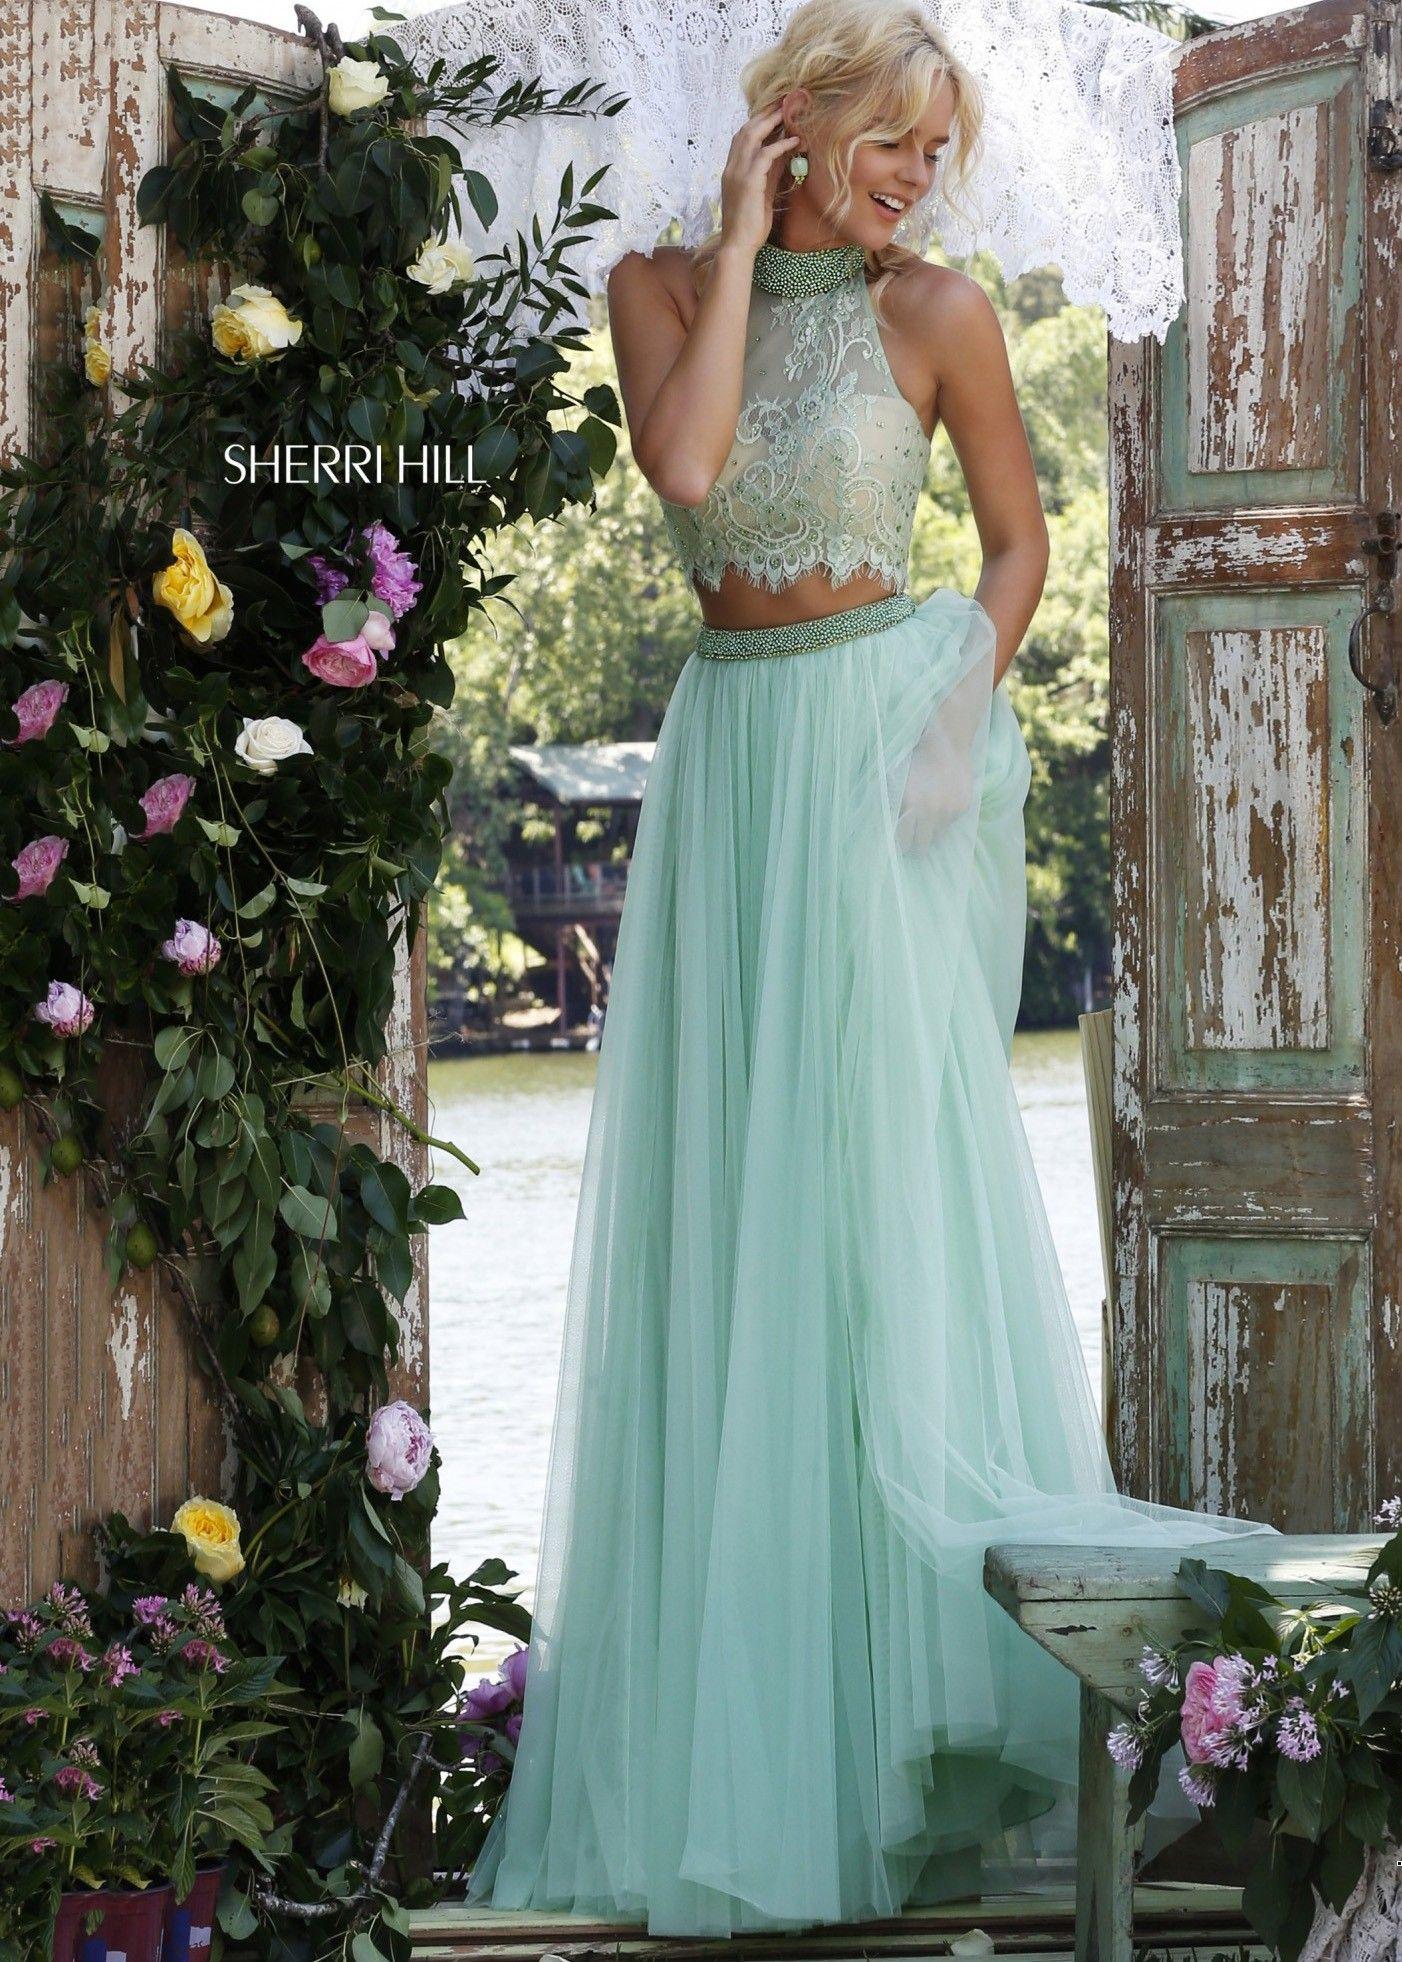 Sherri hill light green fancy lace halter two piece gown